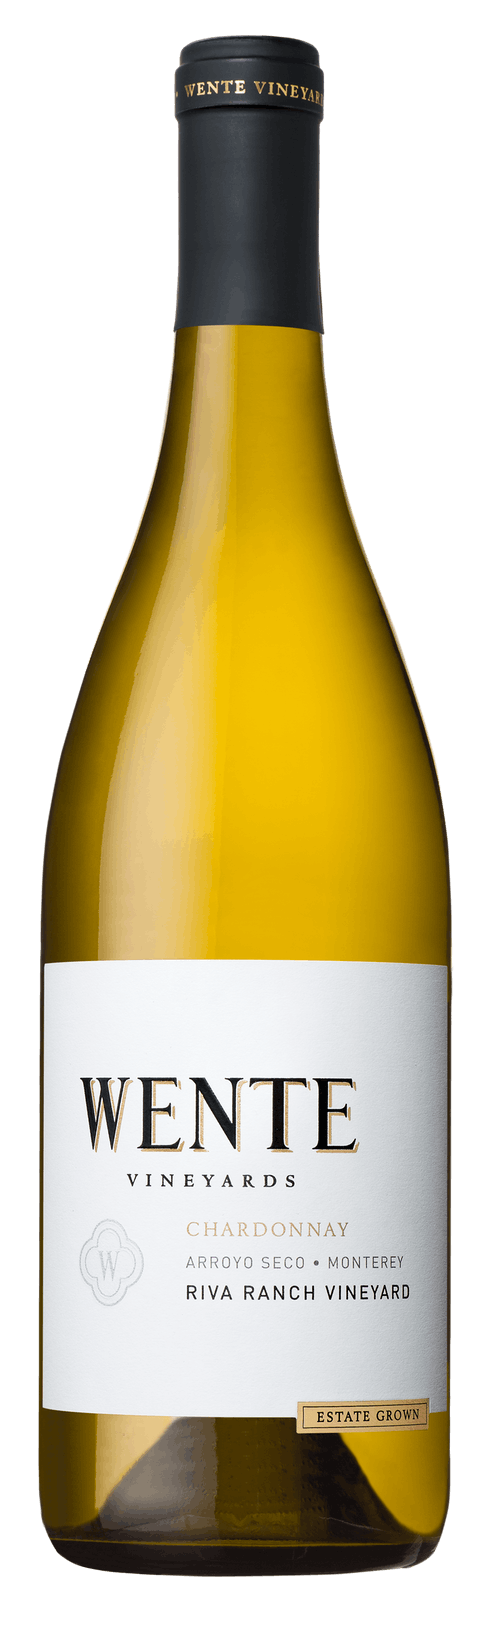 2019 Wente Riva Ranch Chardonnay 750ml